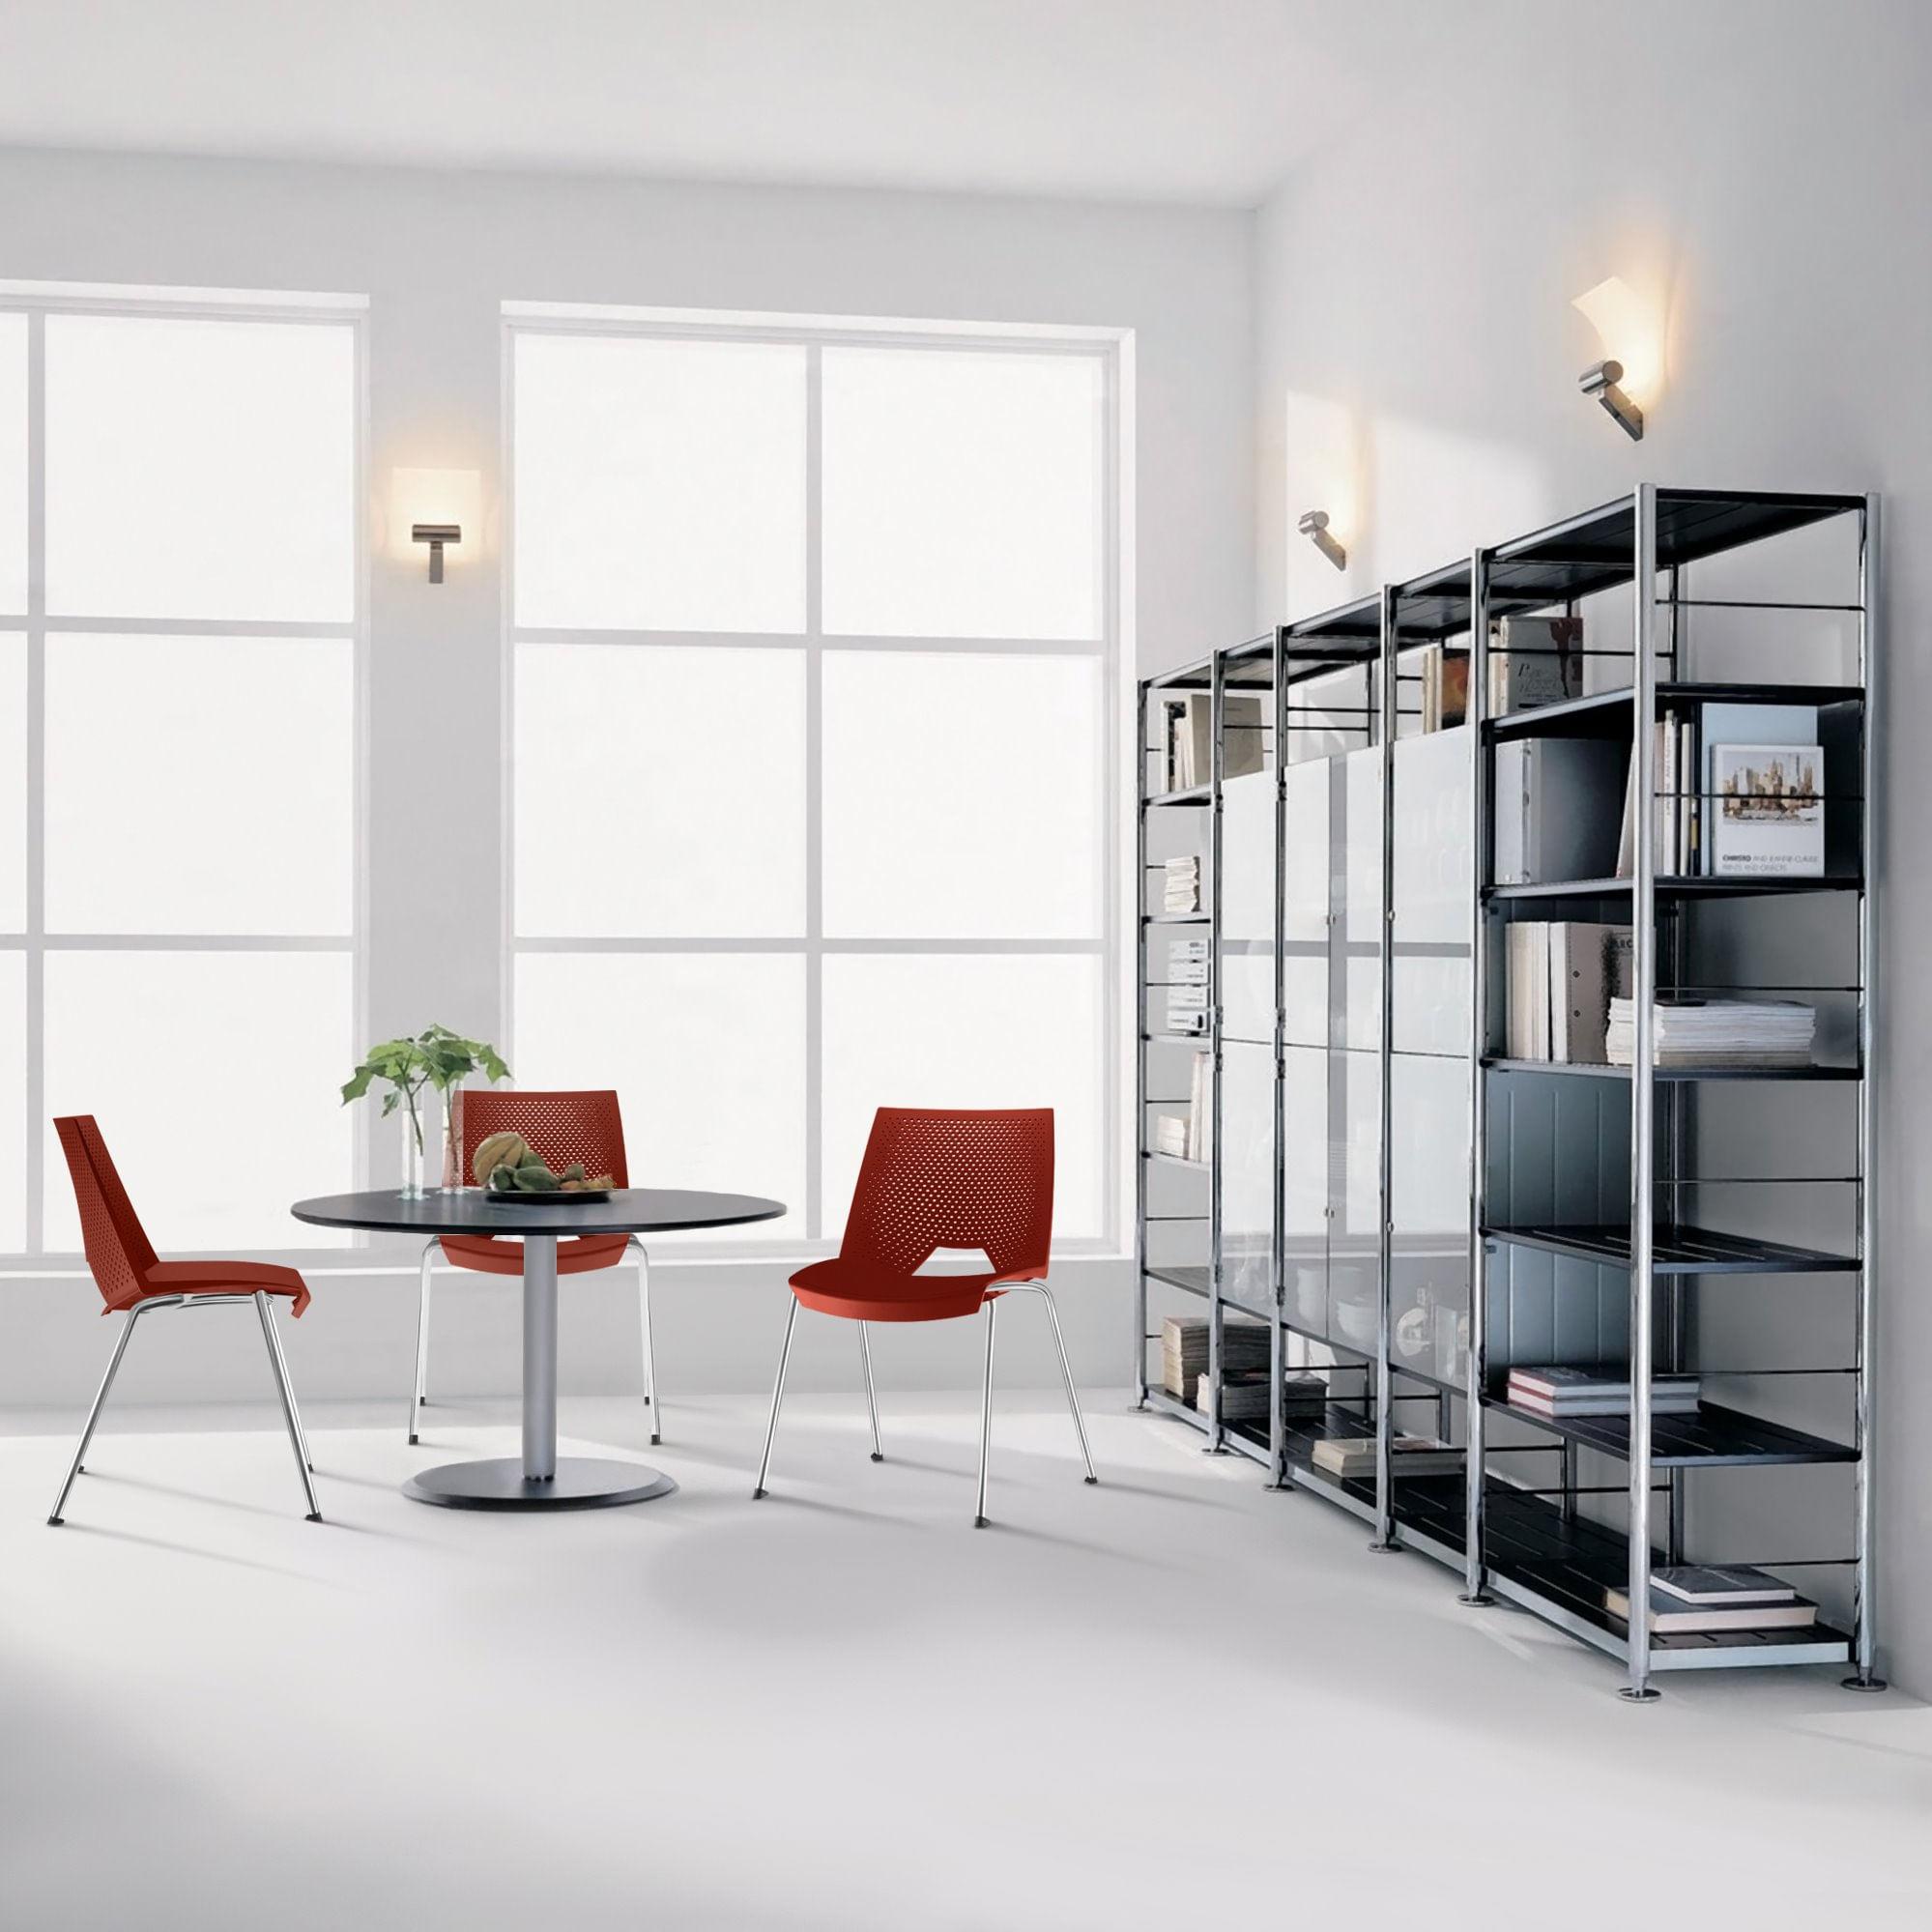 Kit 5 Cadeiras Strike Assento Branco Base Cromada - 57643